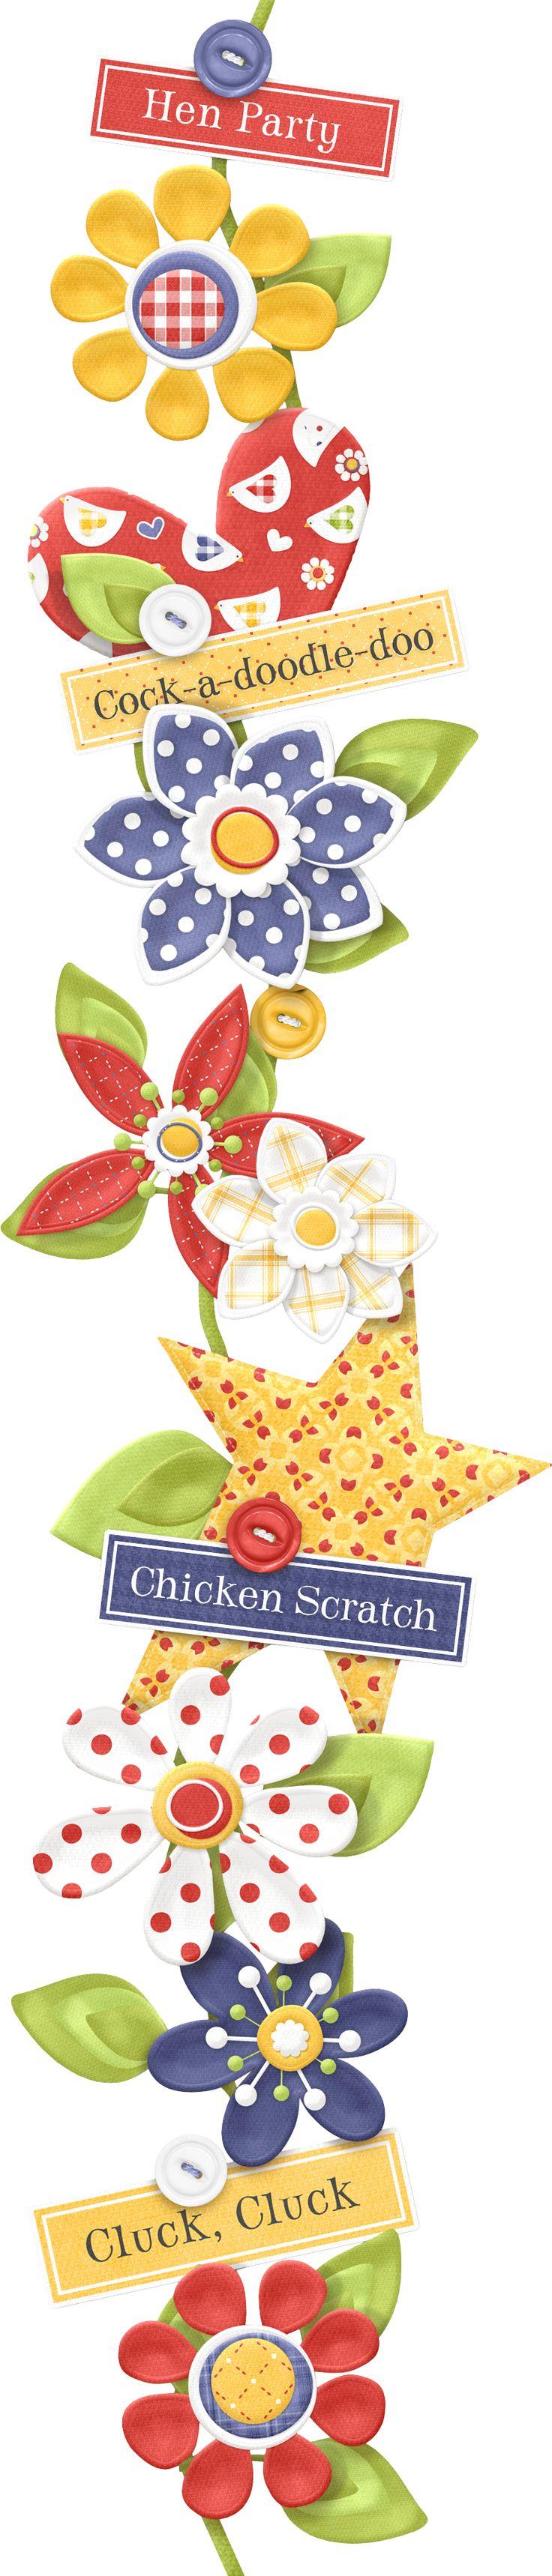 Kitchen chefs clipart clipartfest cartoon restaurant kitchen - Http Luh Happy Minus Com Mbkyb95vpstxhf